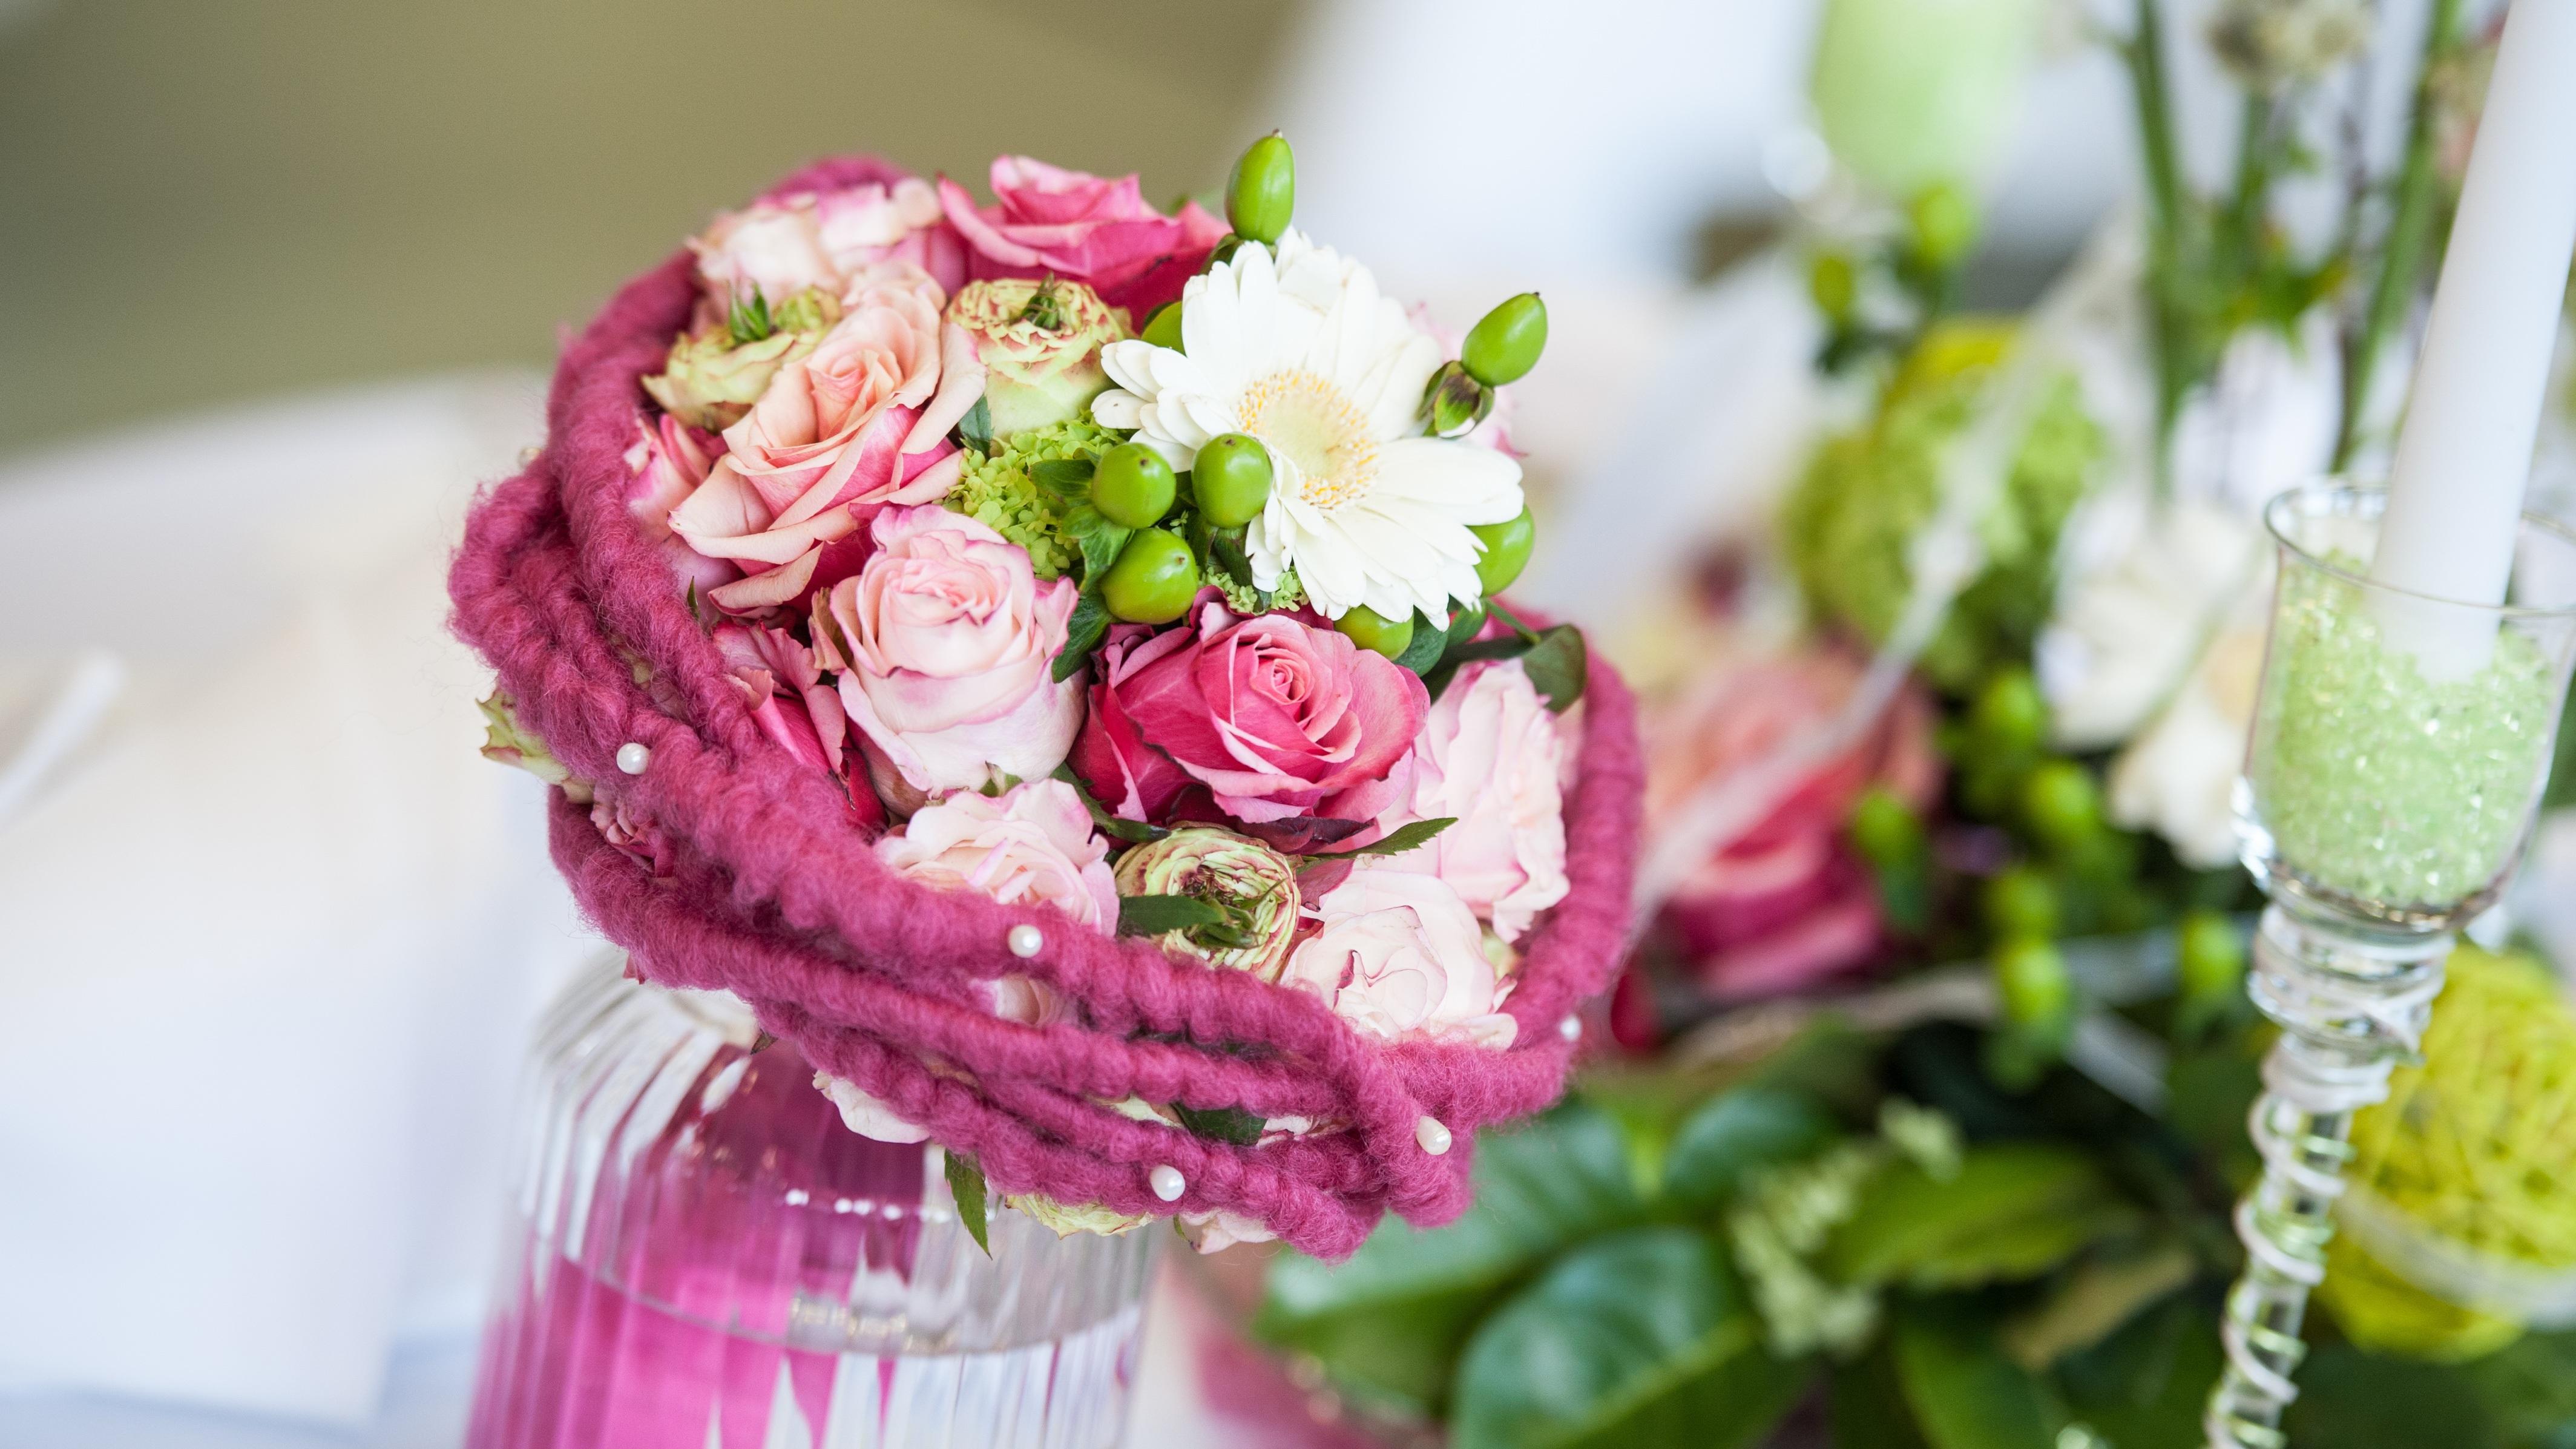 Free Images : plant, petal, pink, wedding, bride, flora, ceremony ...